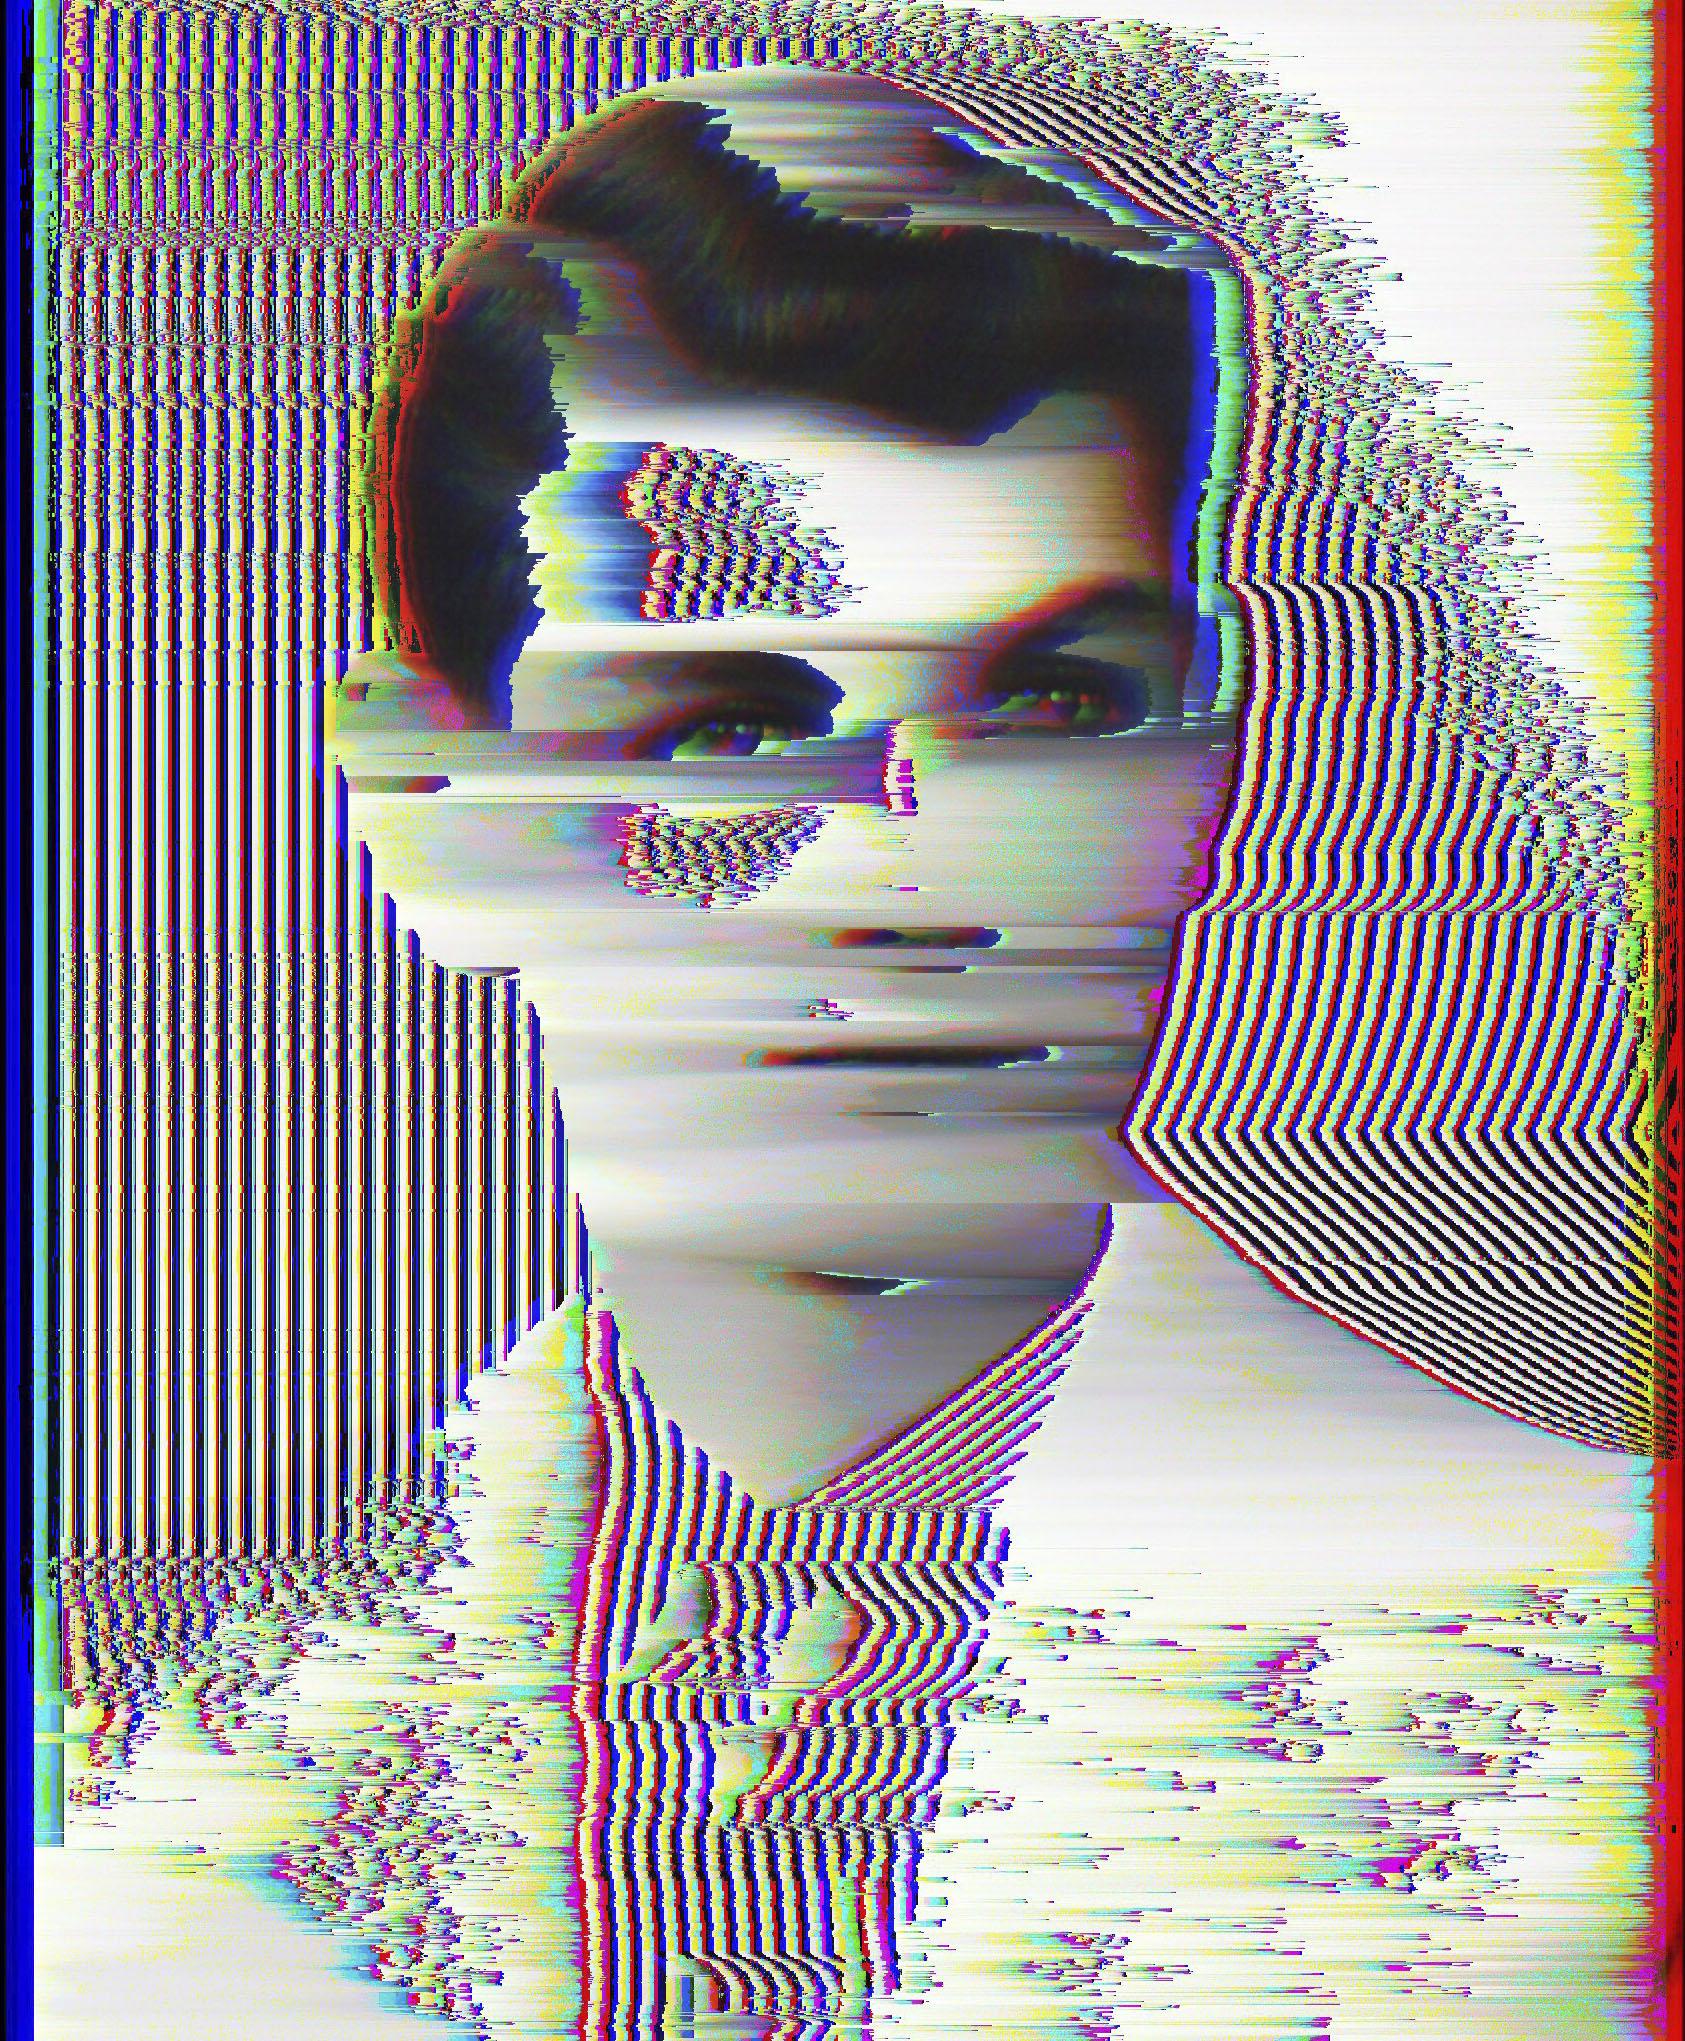 Digital Disintegration    2016  Digitally manipulated image.  Dimensions variable.